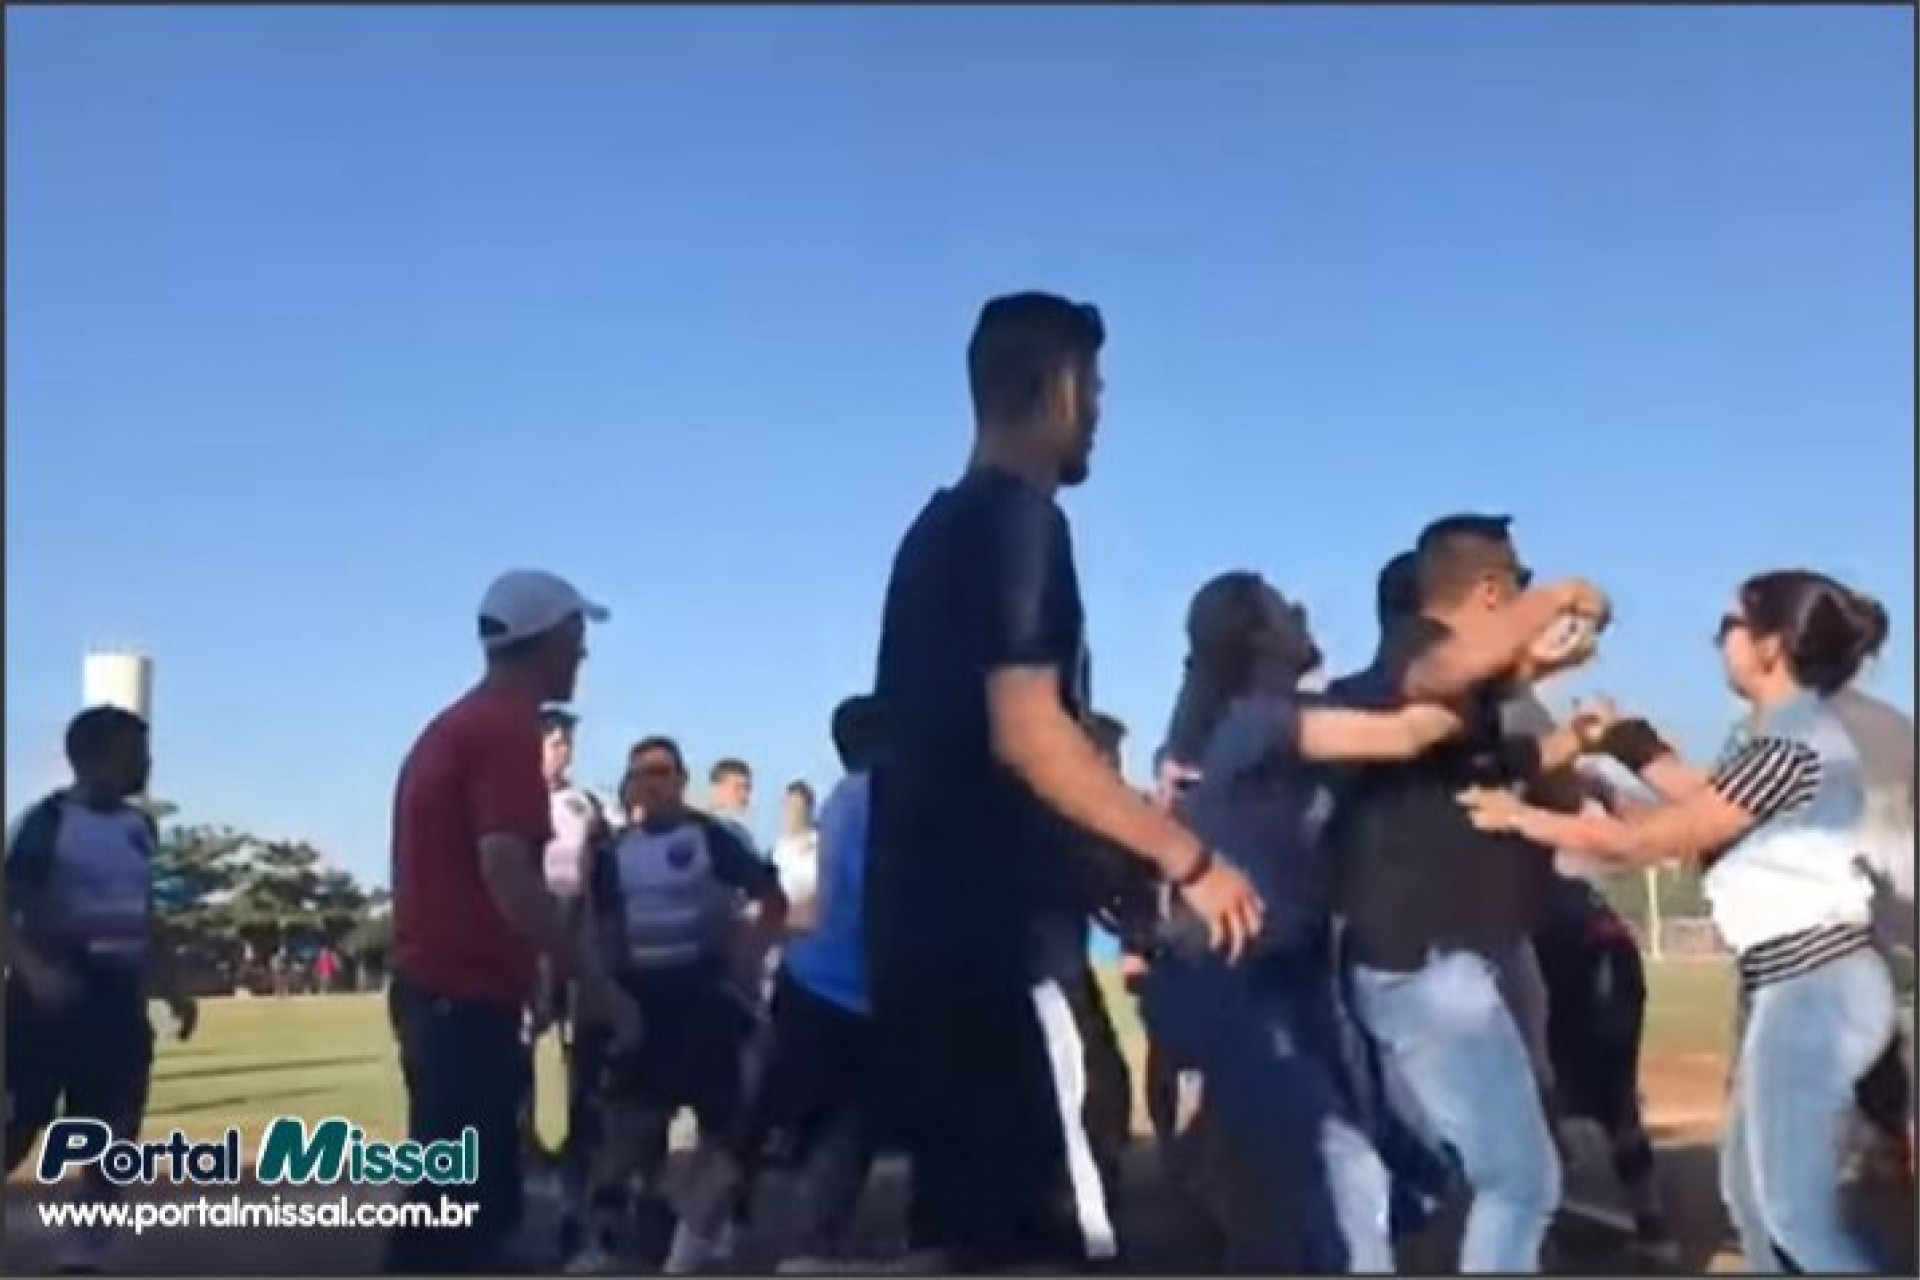 Briga generalizada encerra partida pela Copa Oeste de Futebol: Confira o vídeo